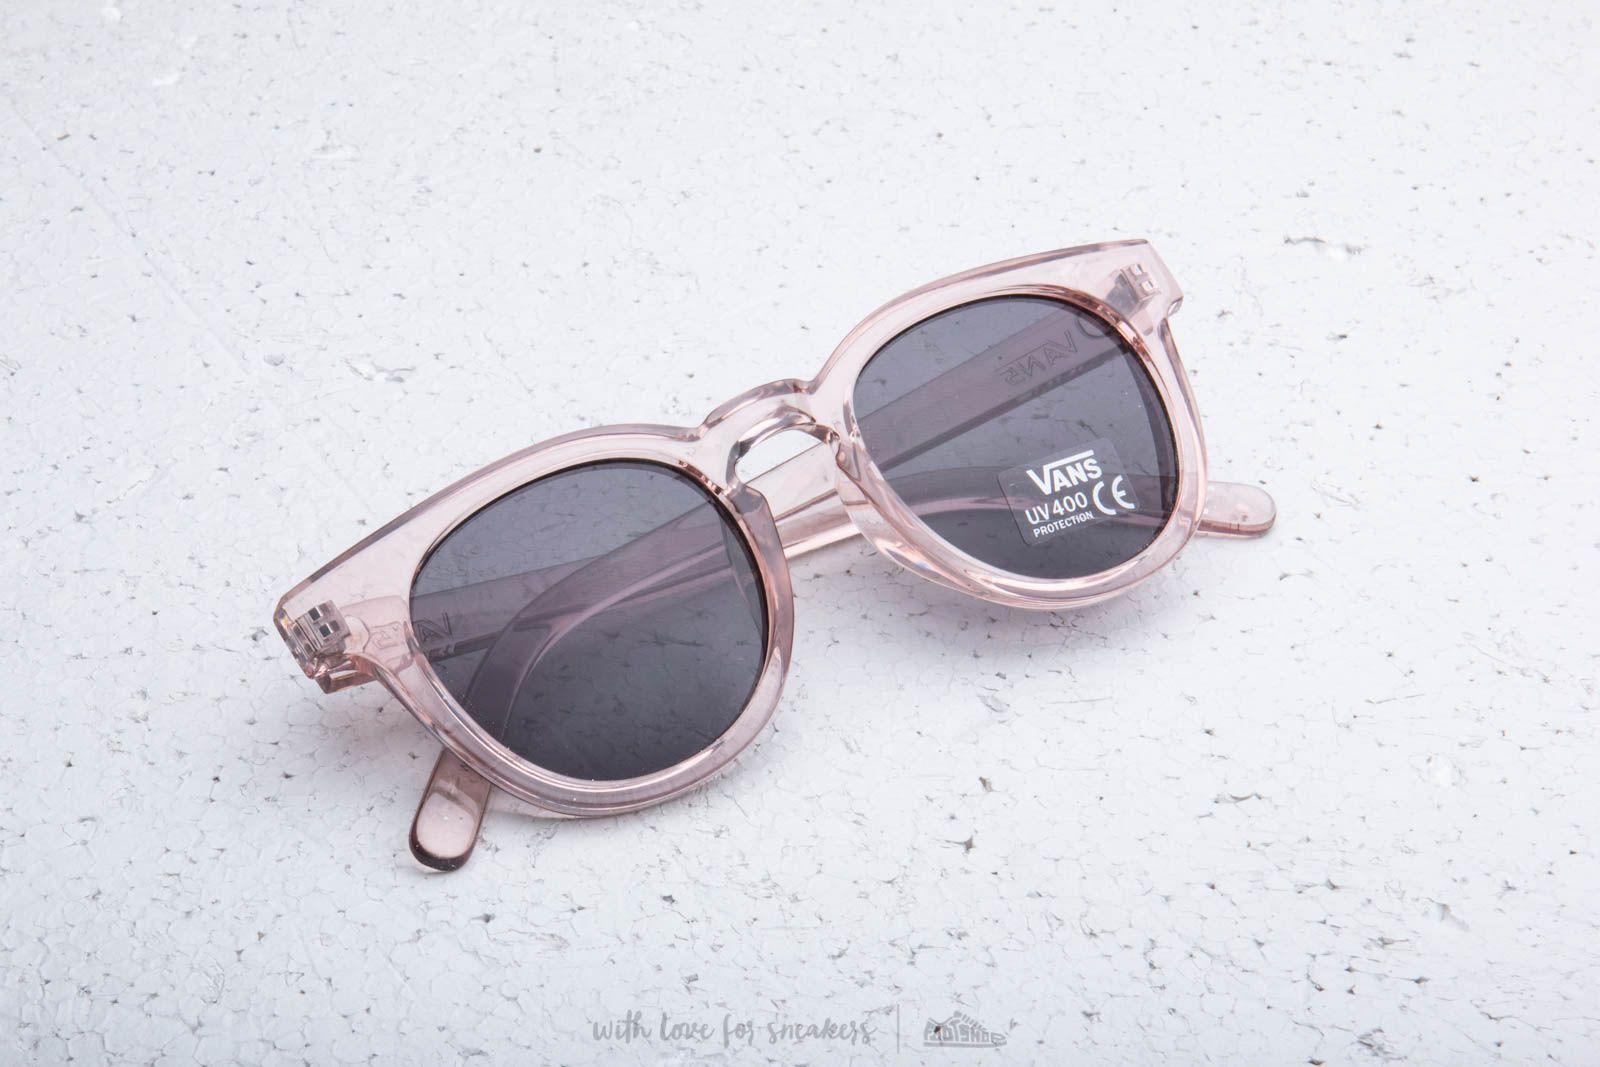 534dee260c534 Vans Wellborn Sunglasses Violet Ice